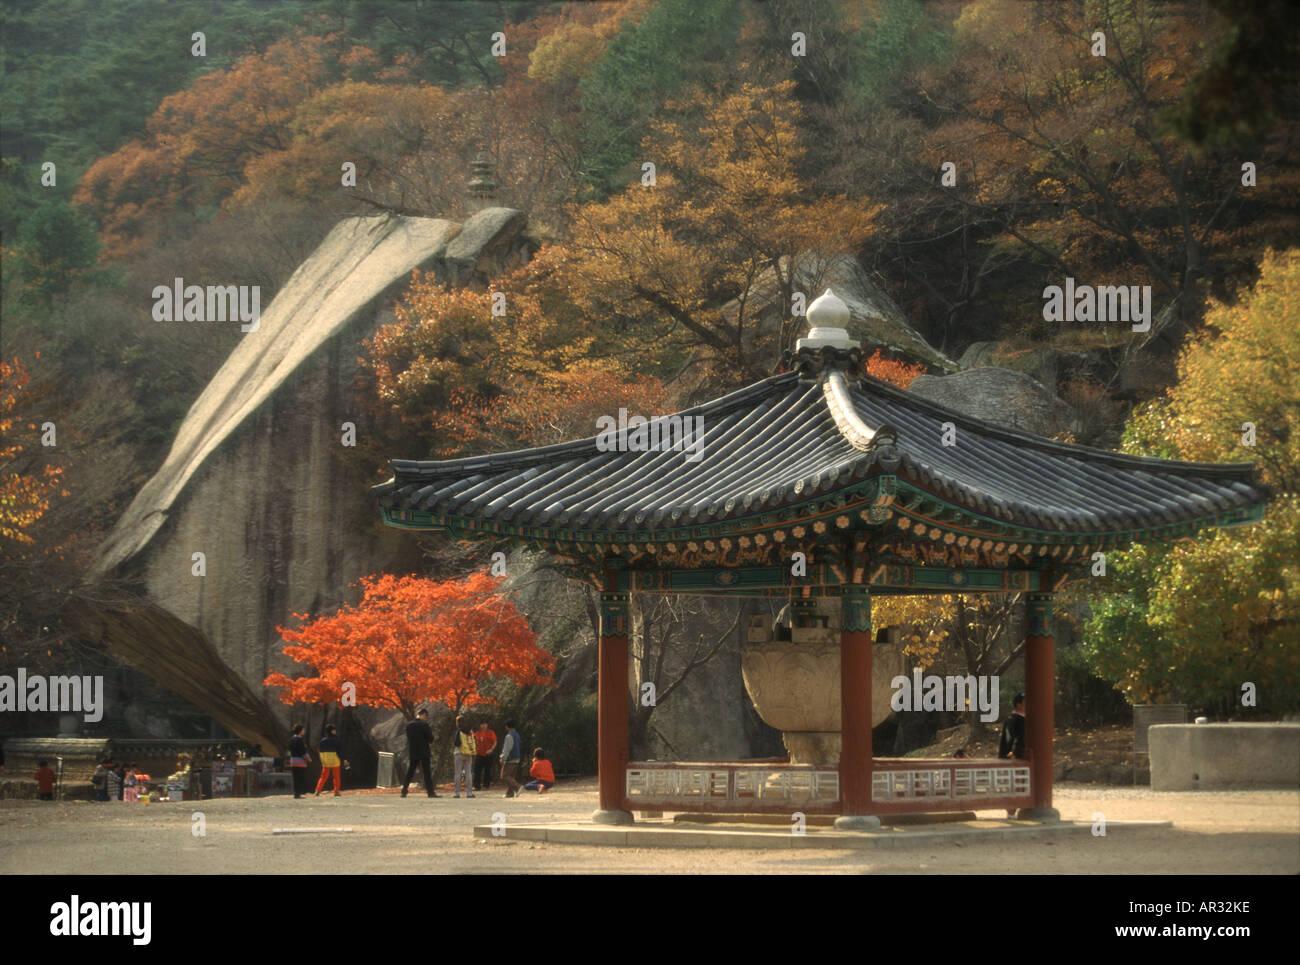 Pavilion, Popchu-sa temple, Popchu-sa, South Korea Asia - Stock Image